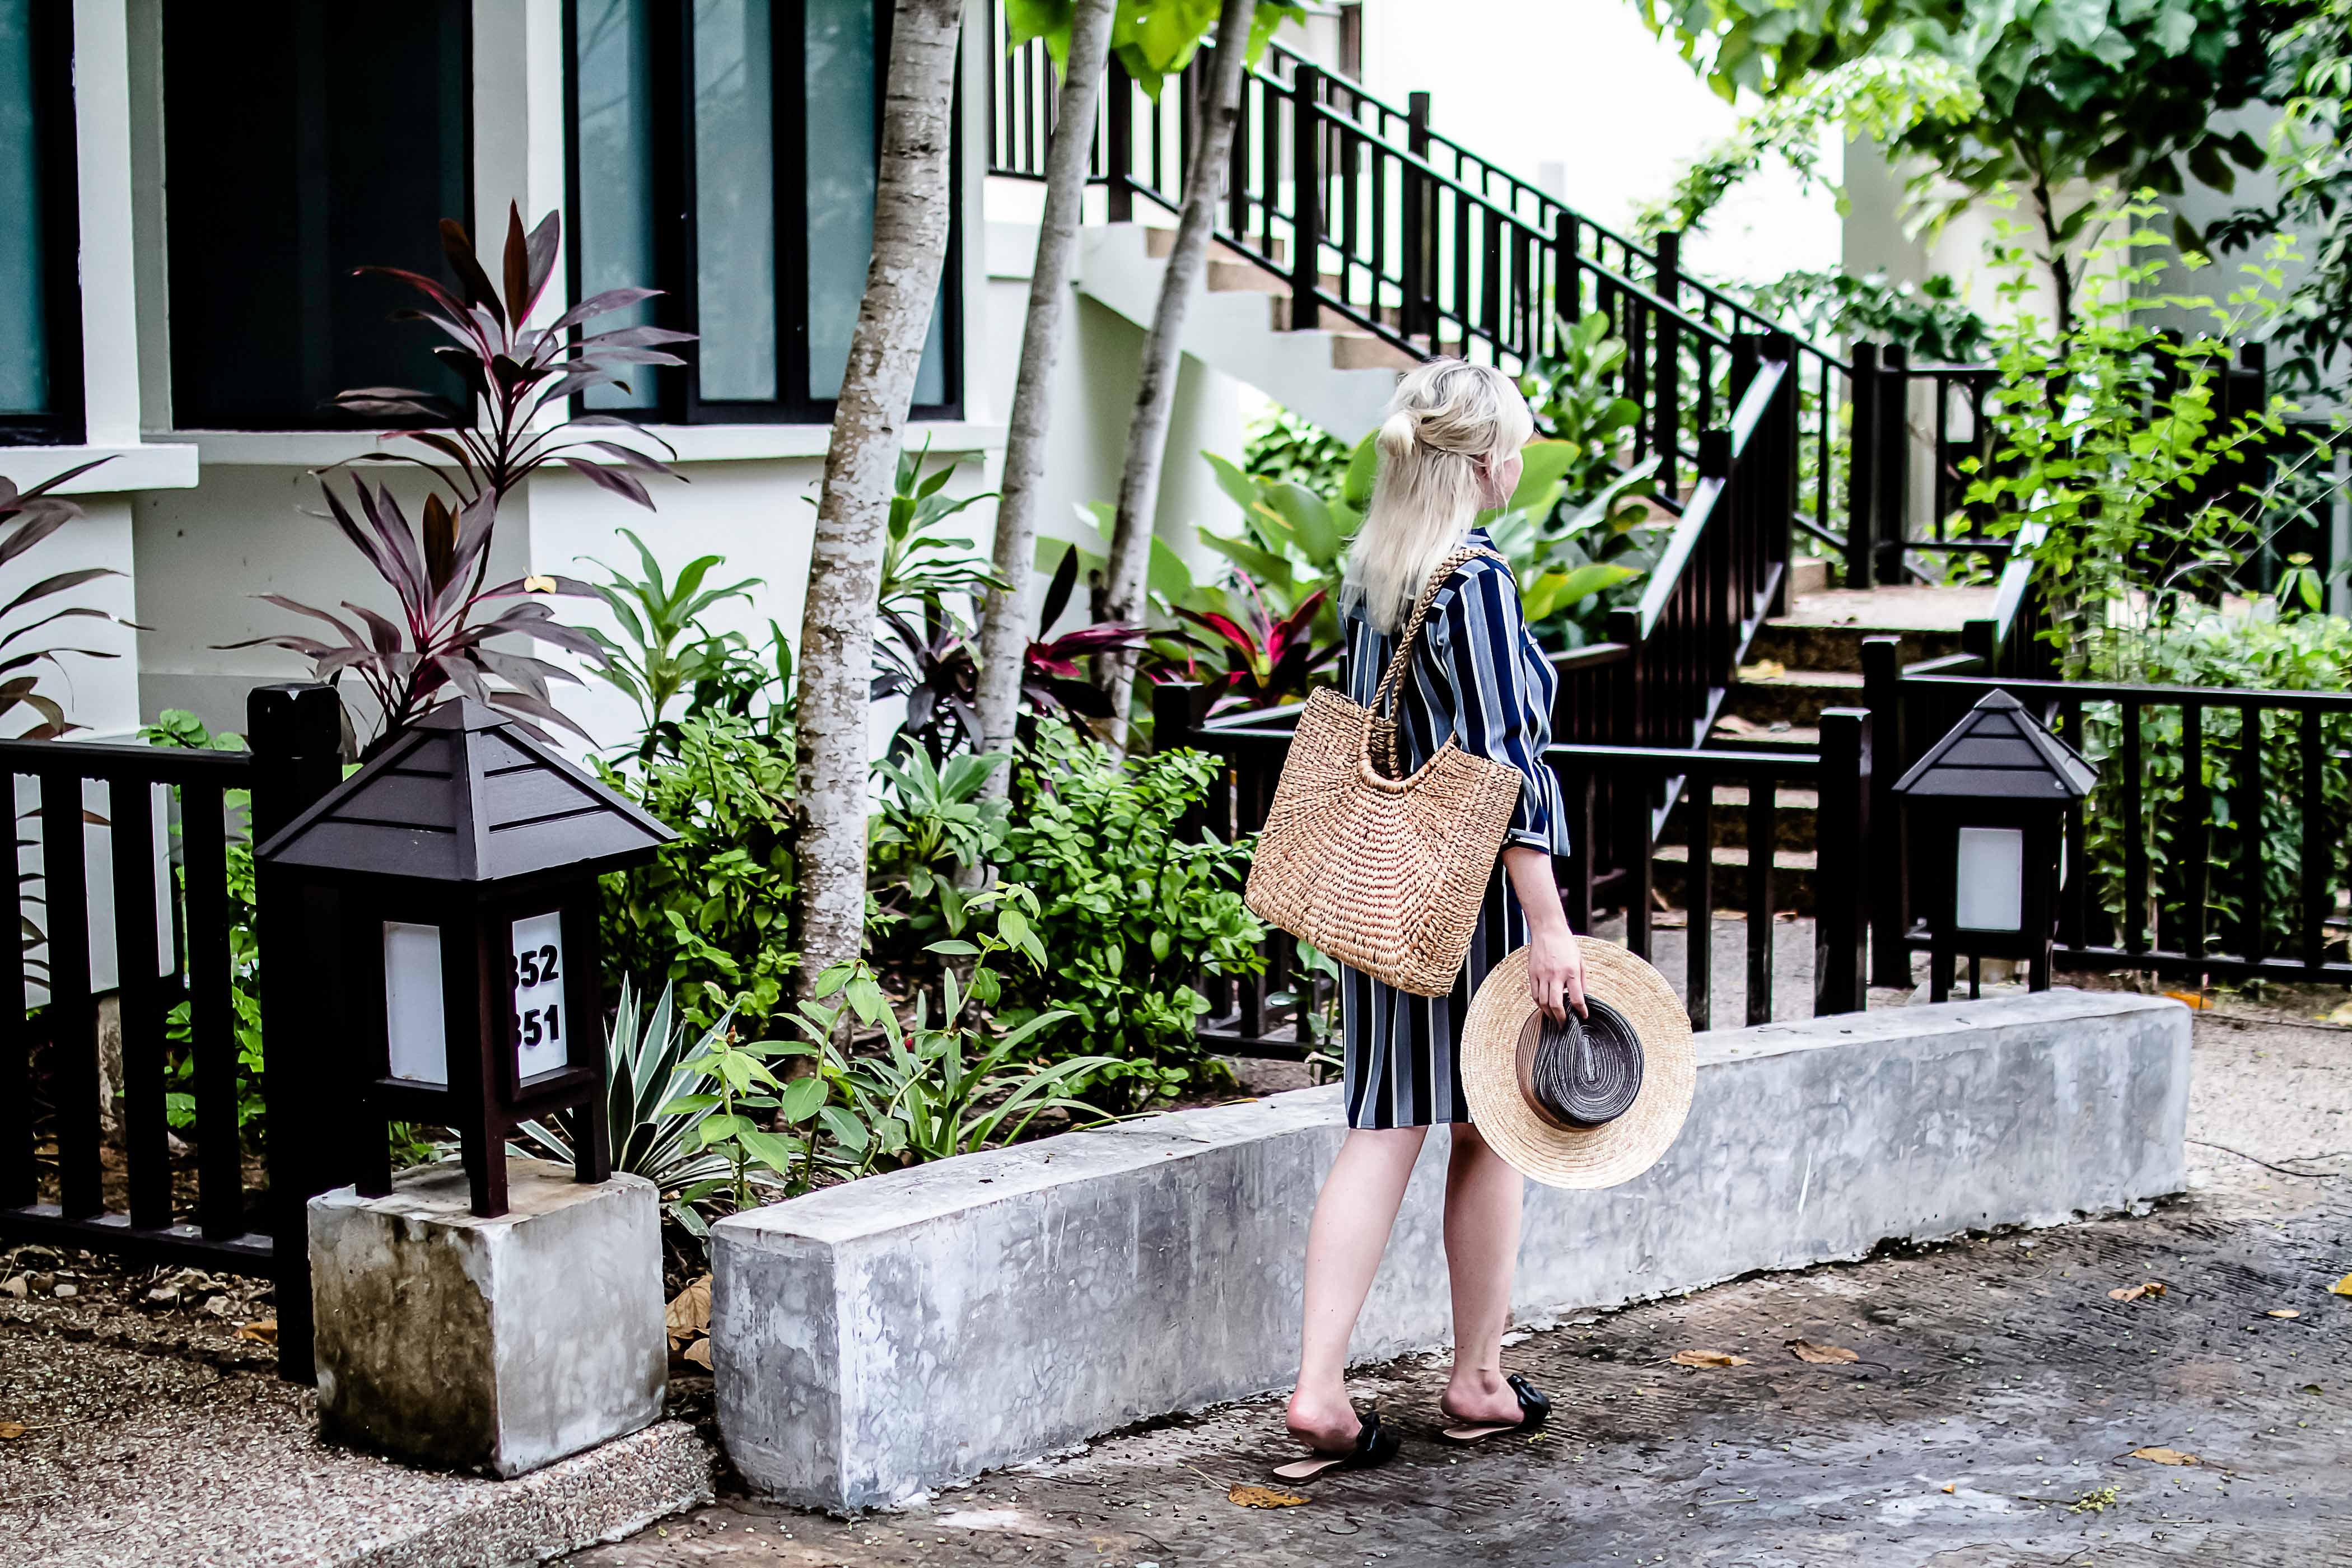 malaysia_travel_blogger_tipps_kota_kinabalu_singapur_airlines_lifestyle_urlaubstipps